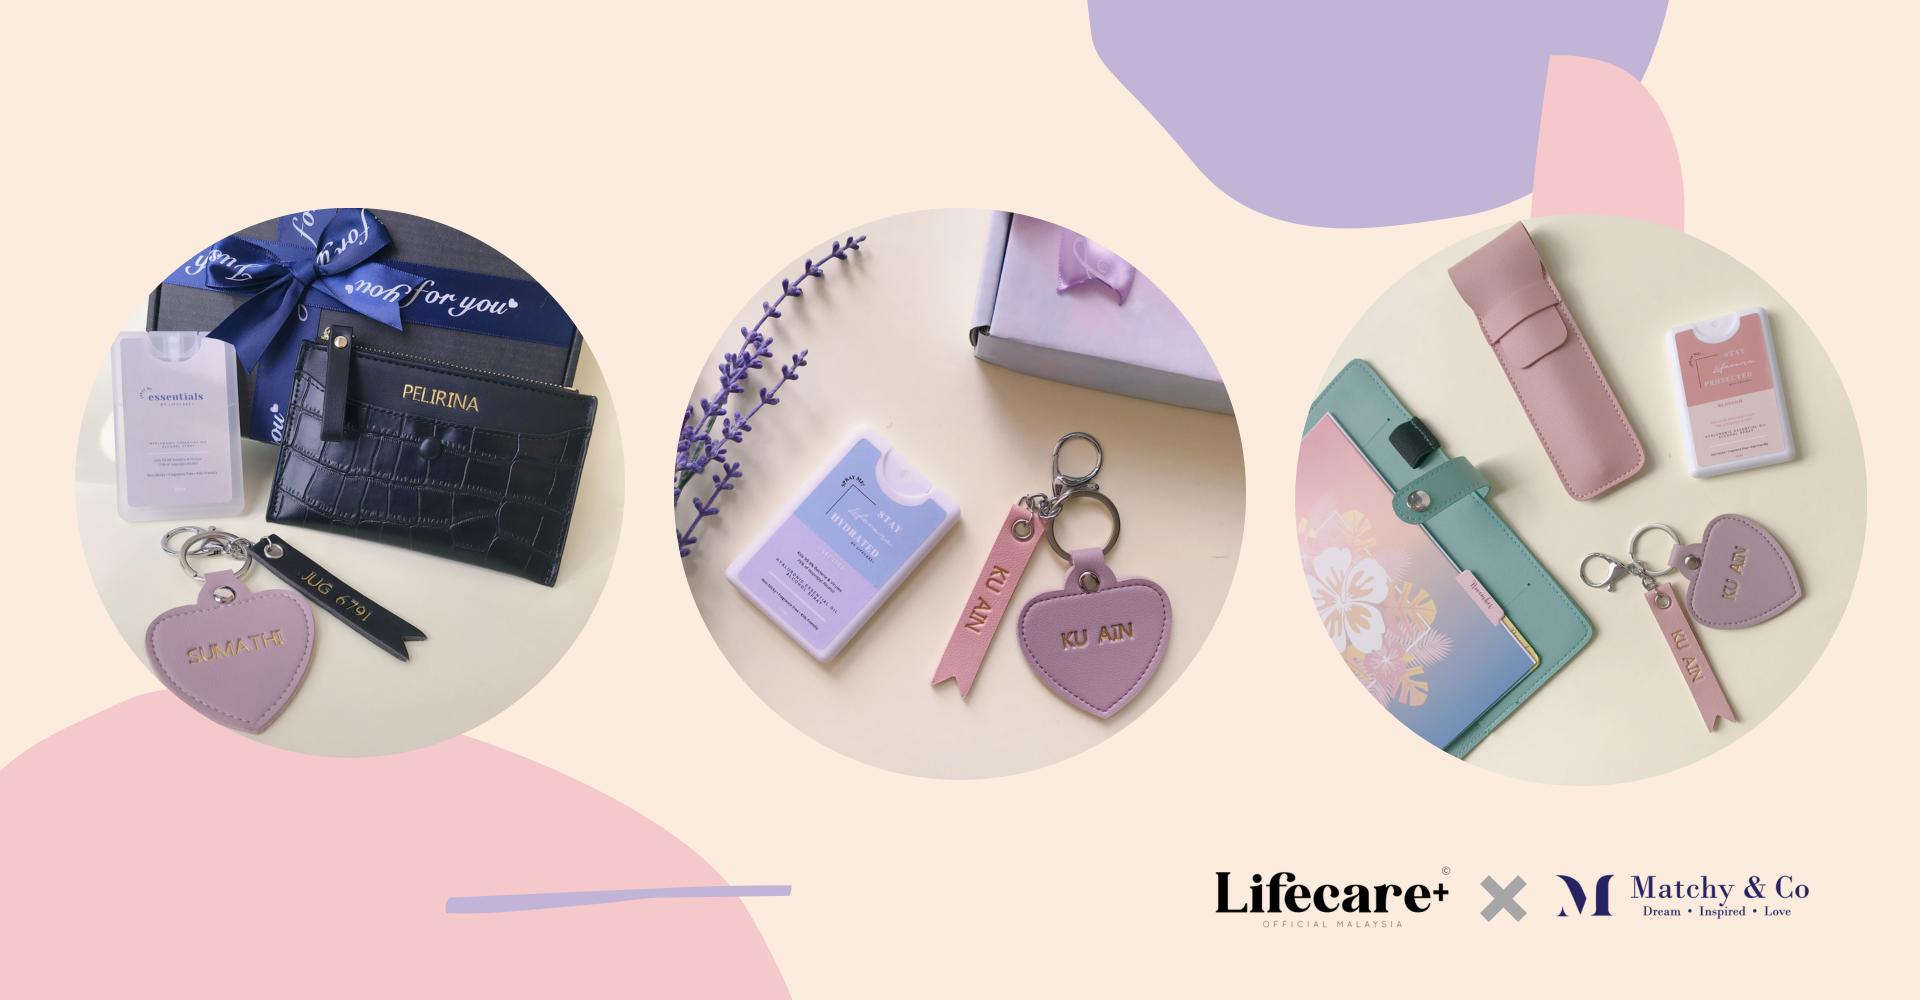 Lifecare Plus x Matchy & Co